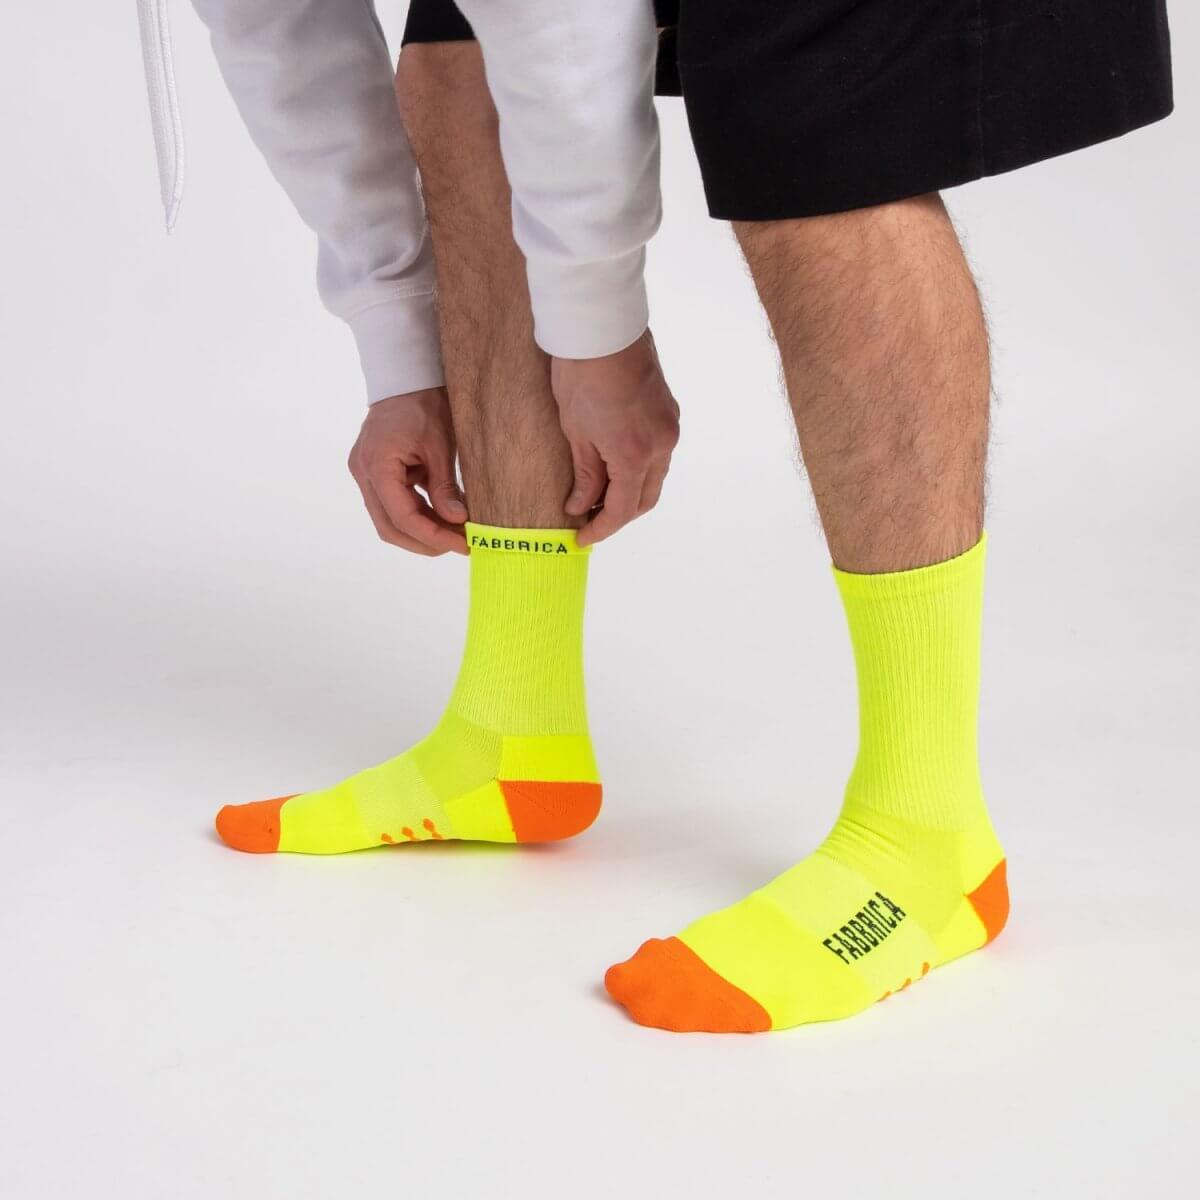 calze-fluo-gialle-qskin-risvolto